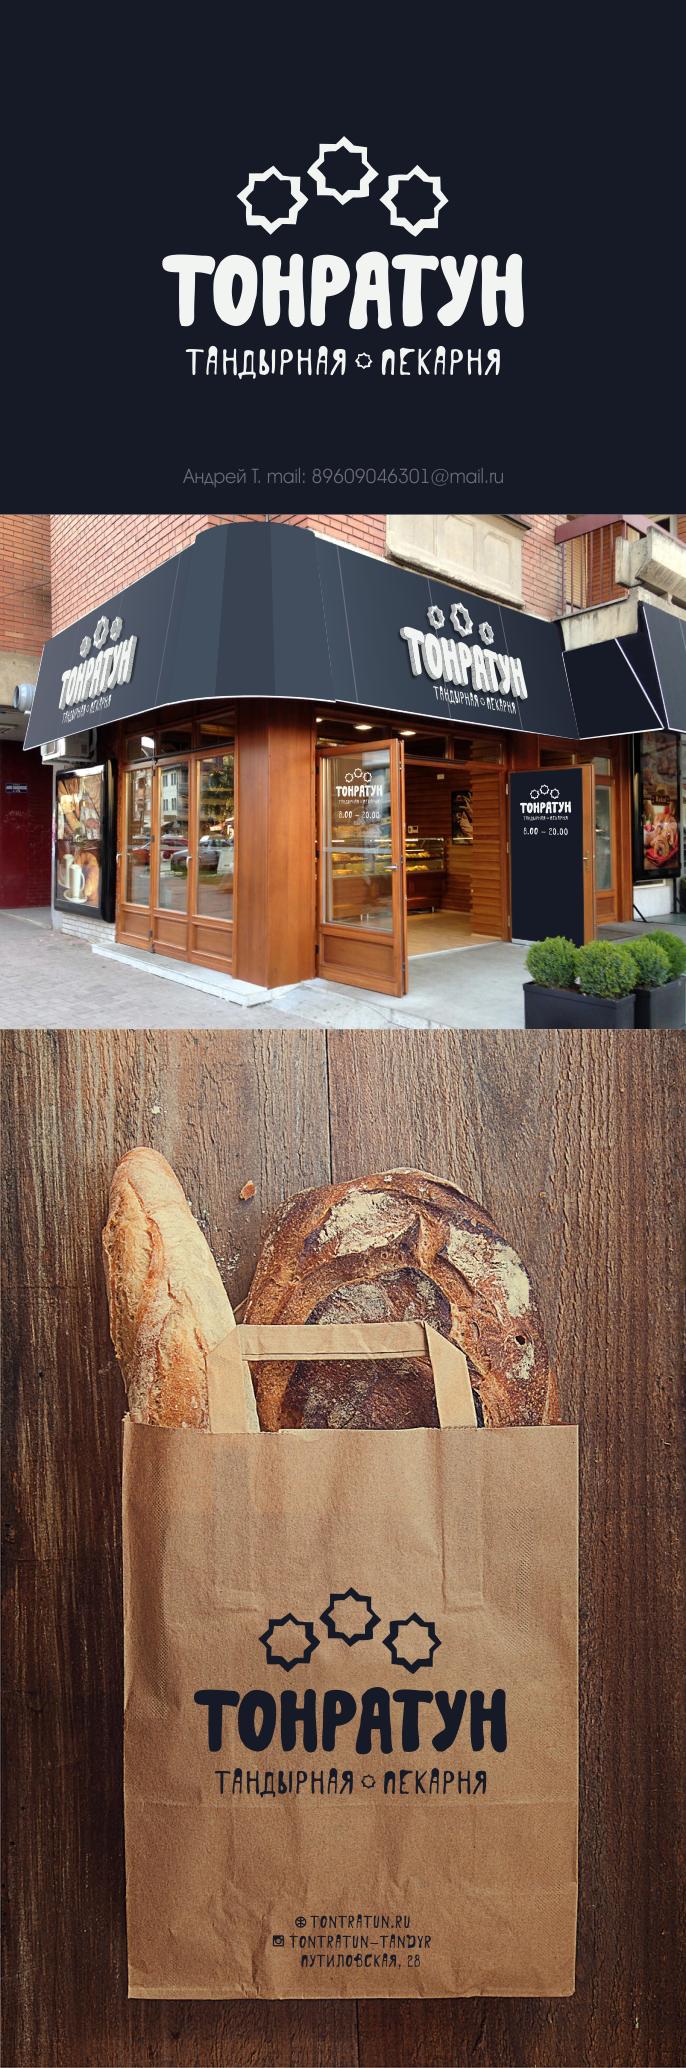 Логотип для Пекарни-Тандырной  фото f_9465d8f5f6bccfee.png